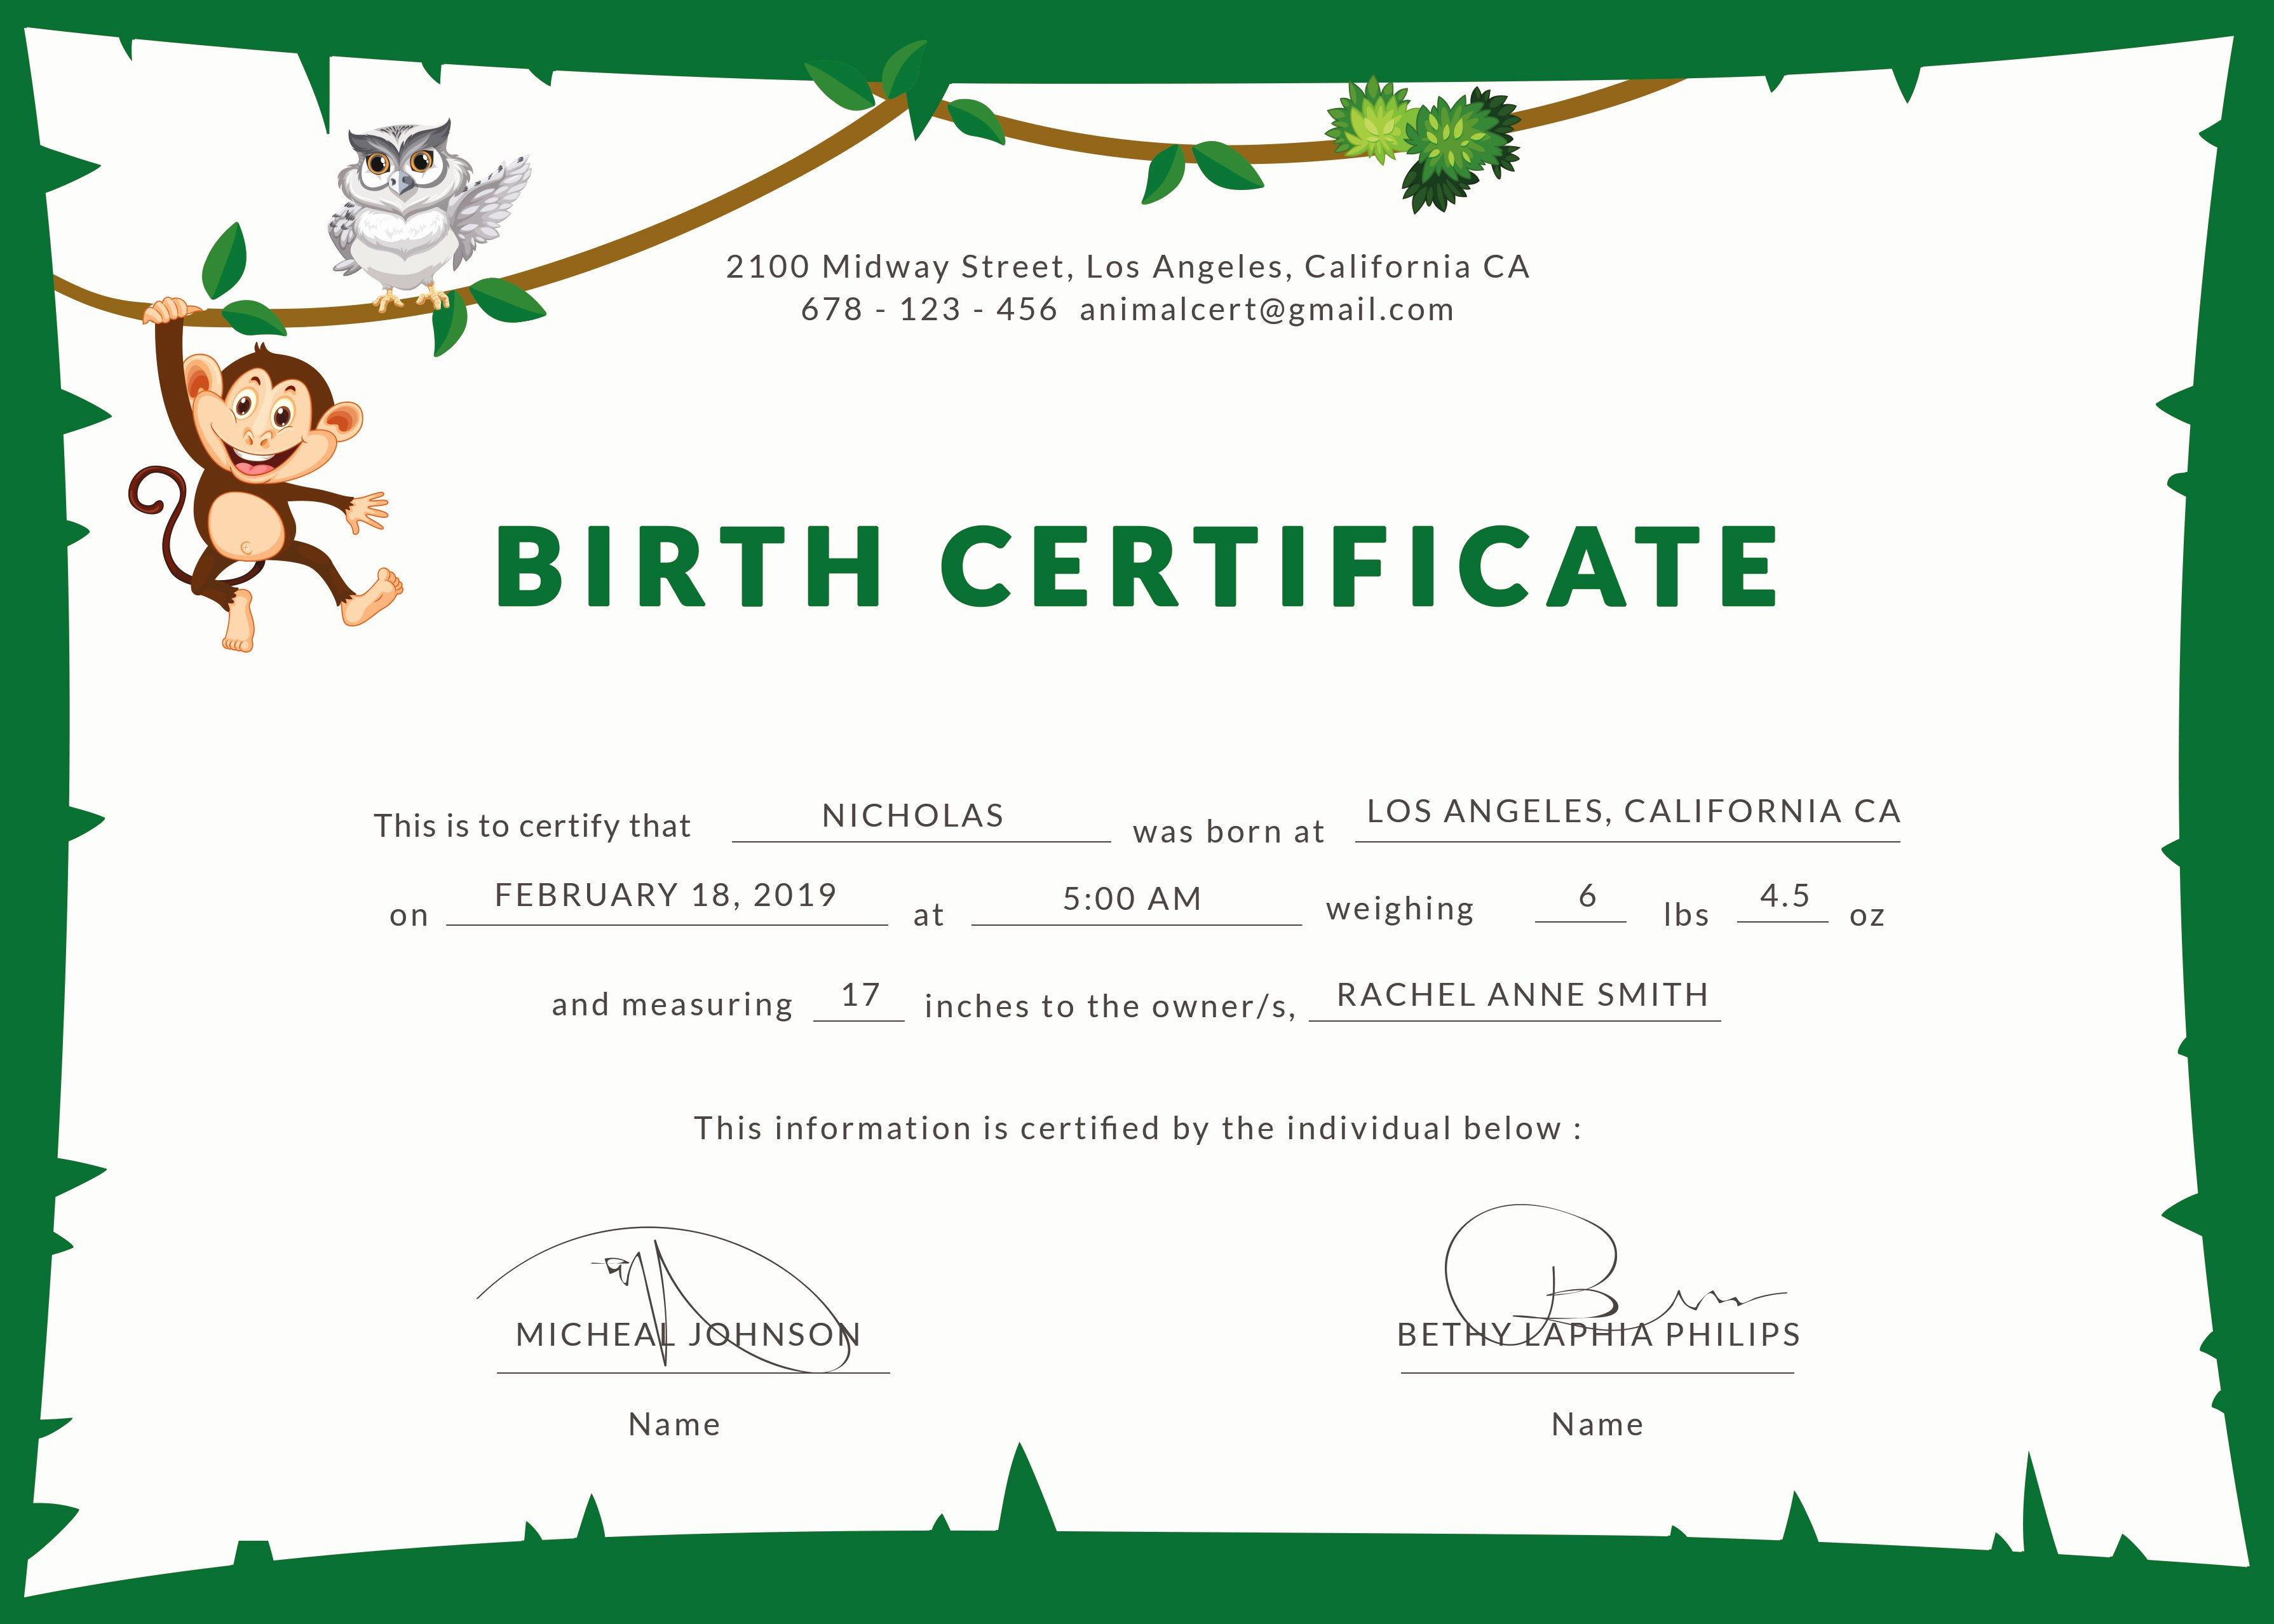 Official Birth Certificate Template Fresh Birth Certificate